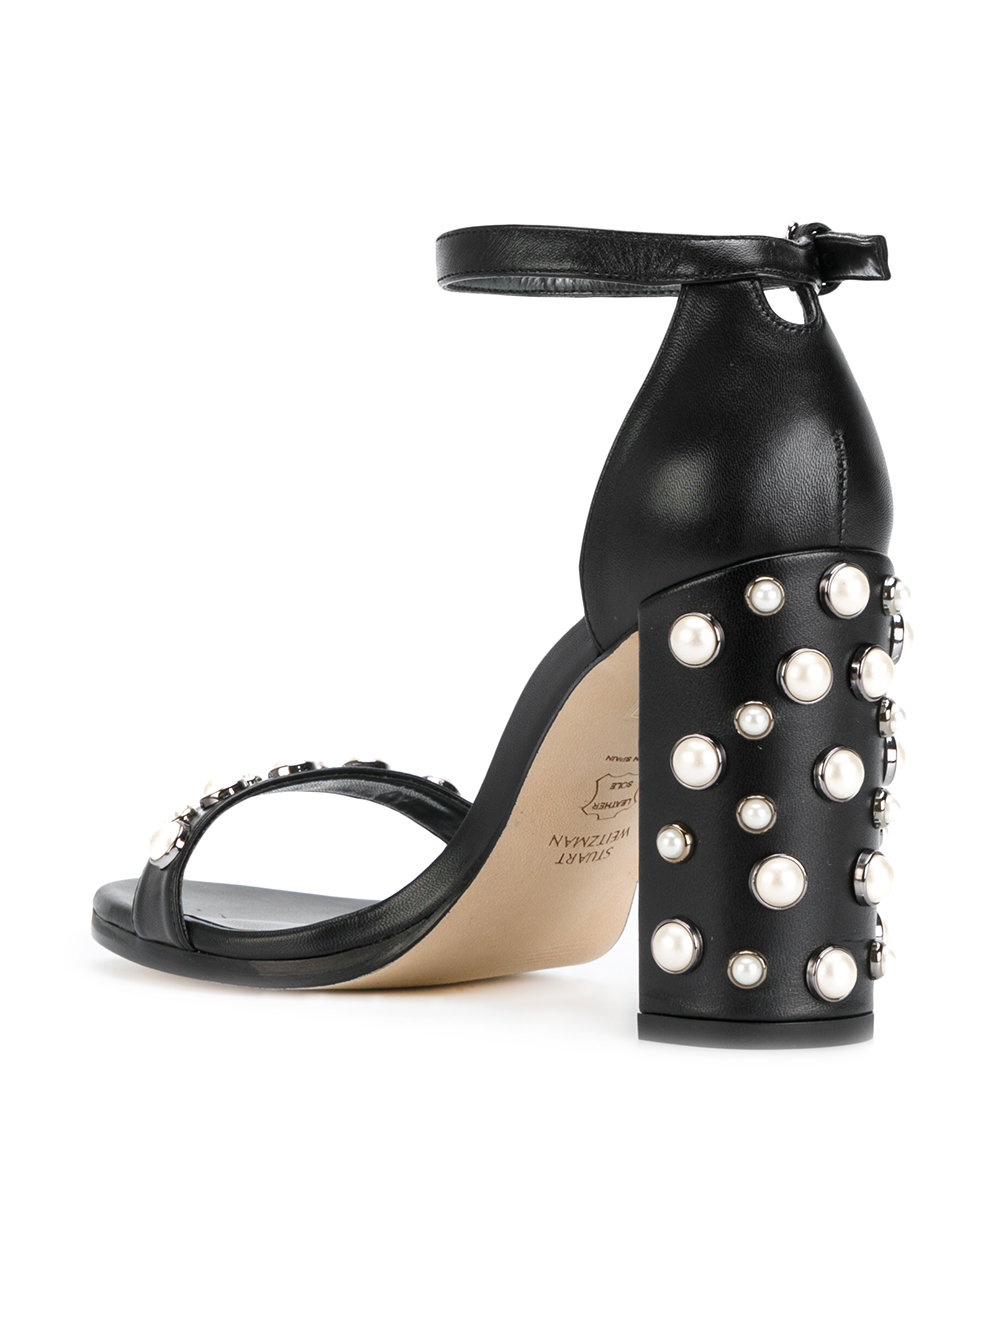 STUART WEITZMAN sandals - $455